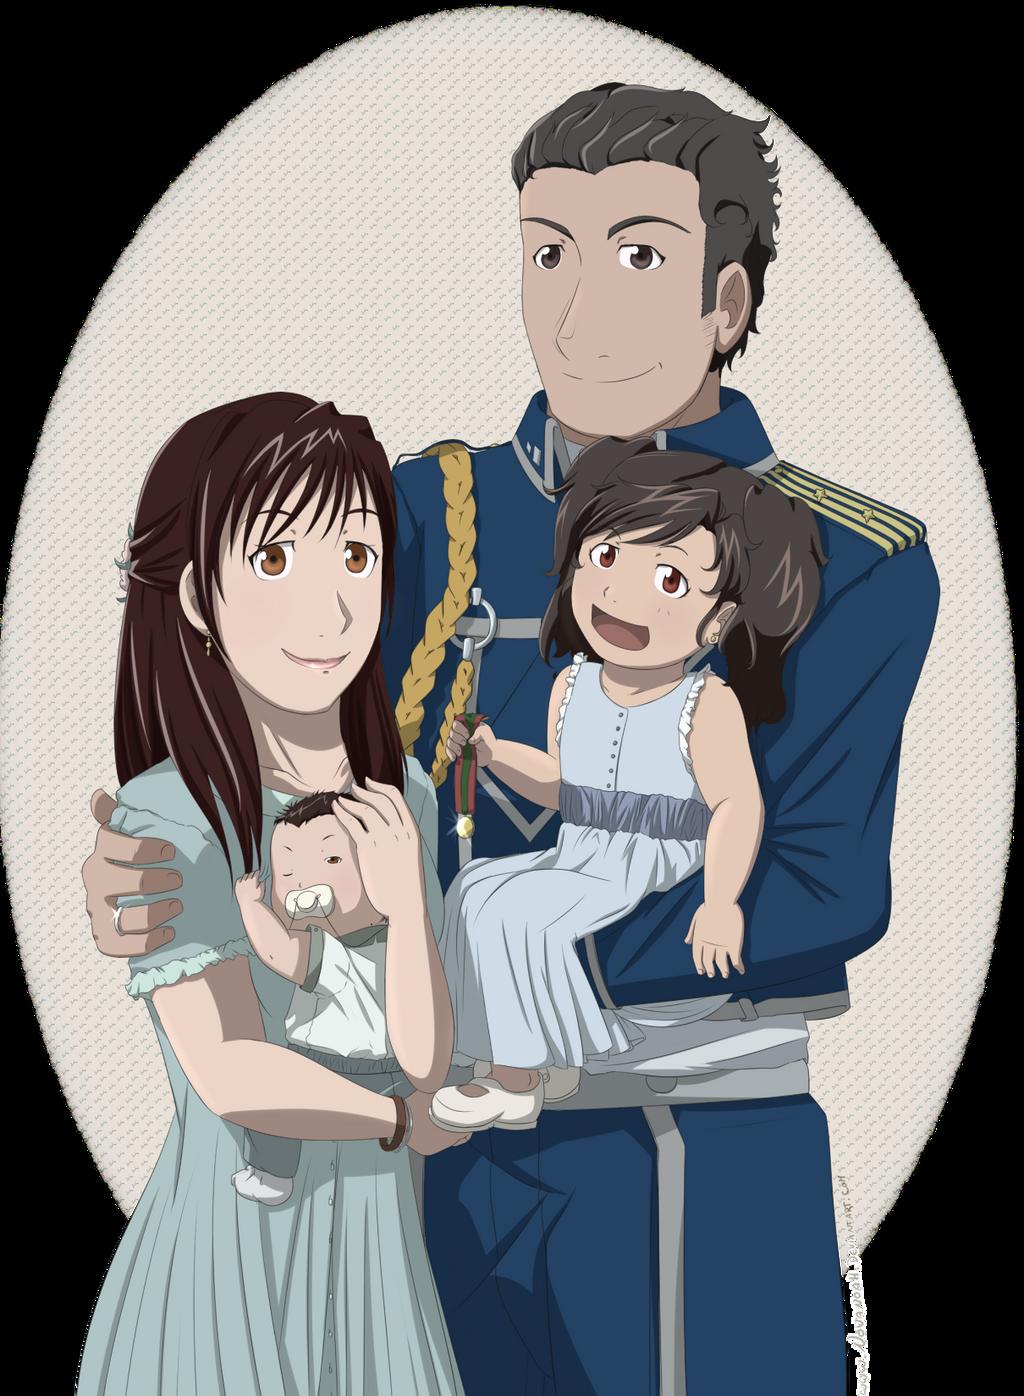 Roswell Family Portrait by NoVaNoah on DeviantArt